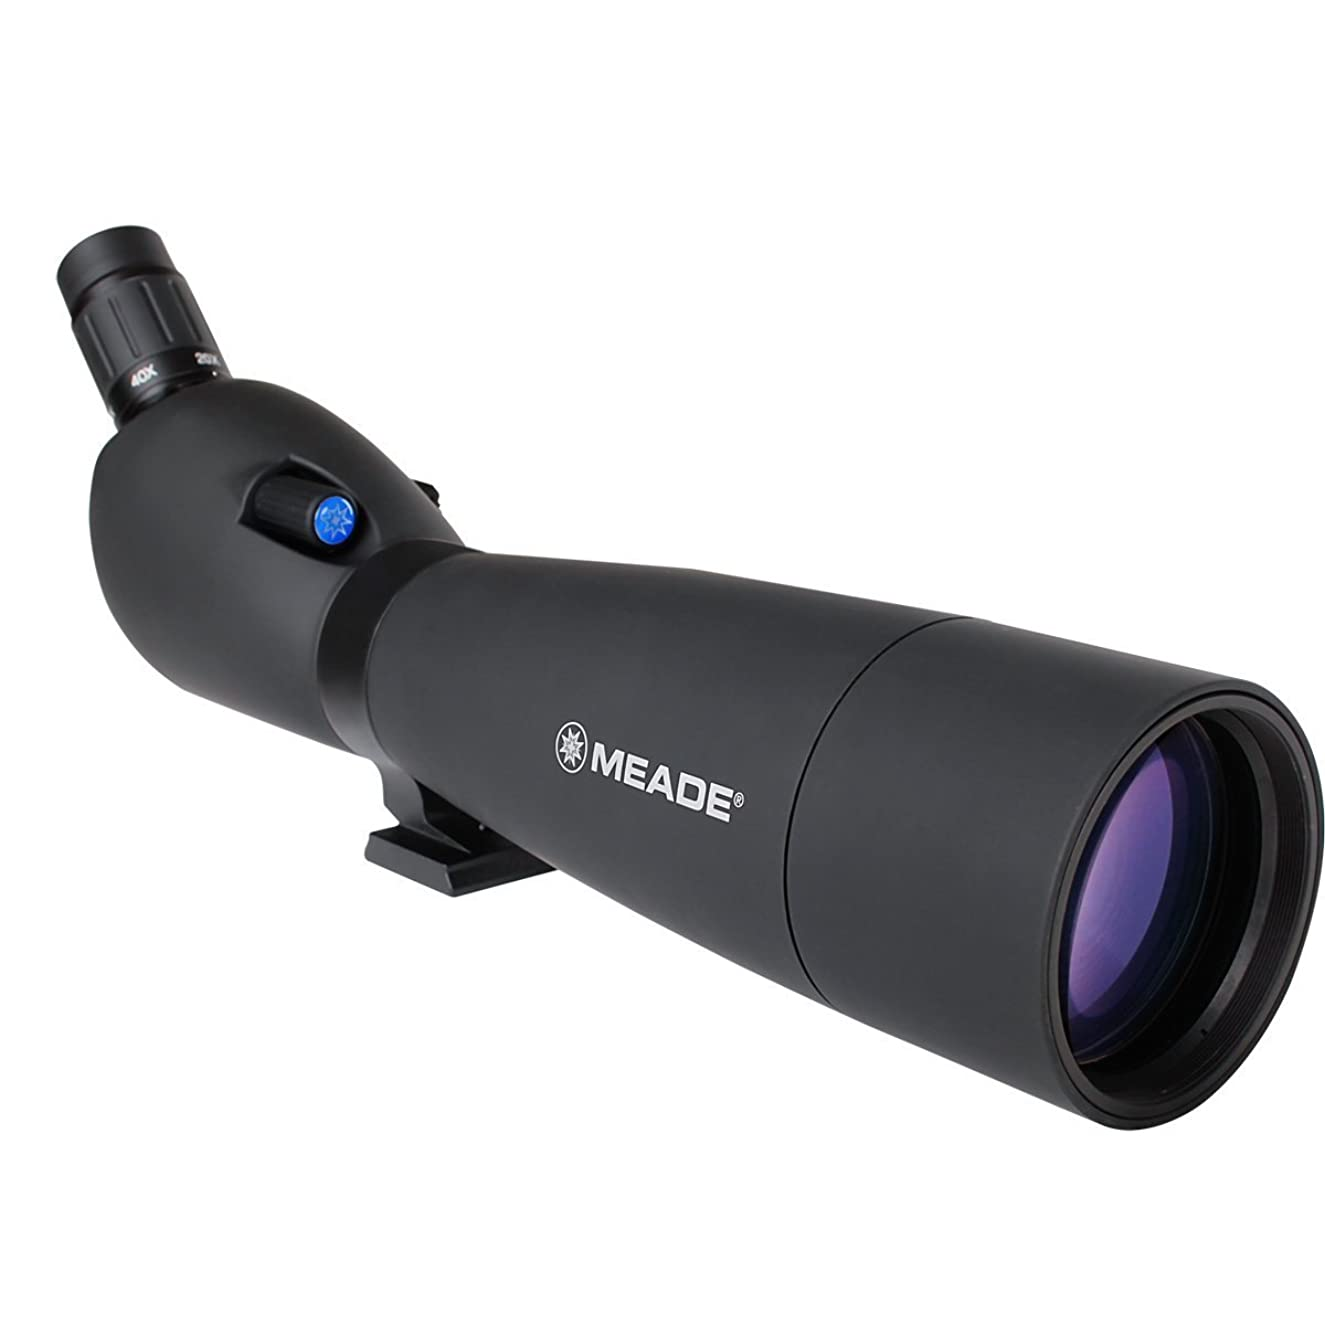 Meade Instruments 126001 Wilderness Spotting Scope - 20-60x80-mm (Black)